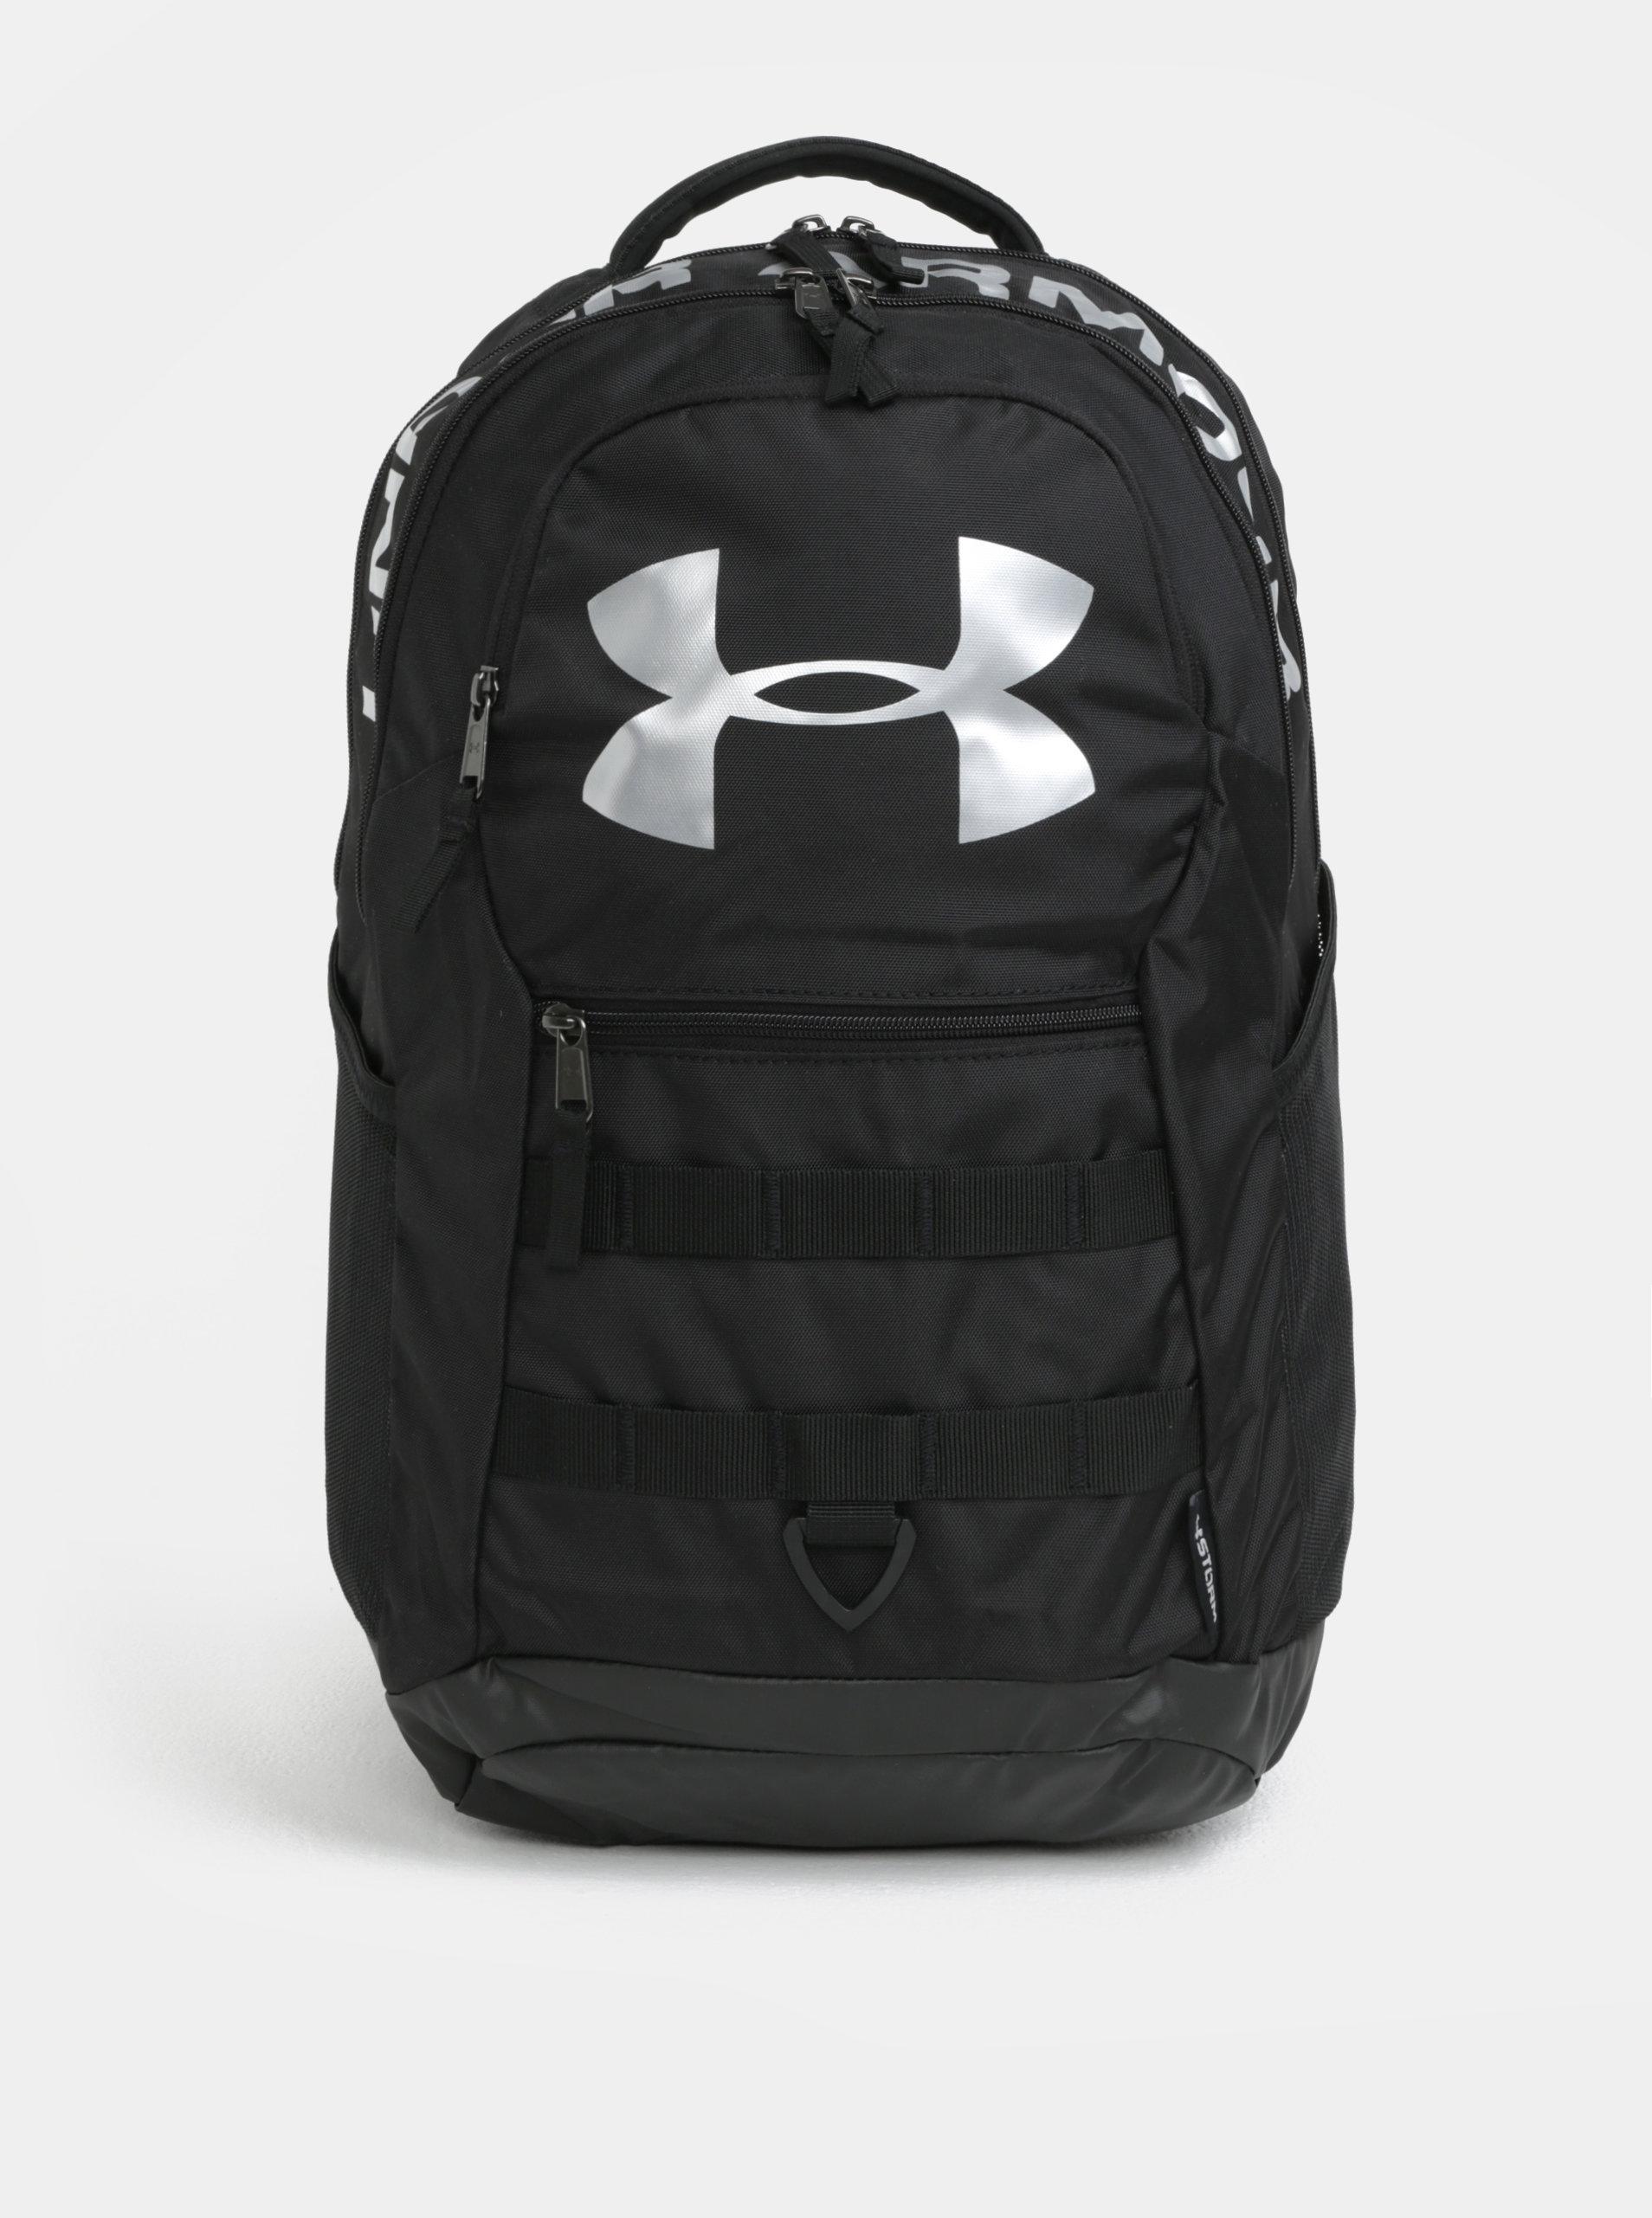 4115e7ab4d Černý voděodolný batoh s reflexními prvky Under Armour ...